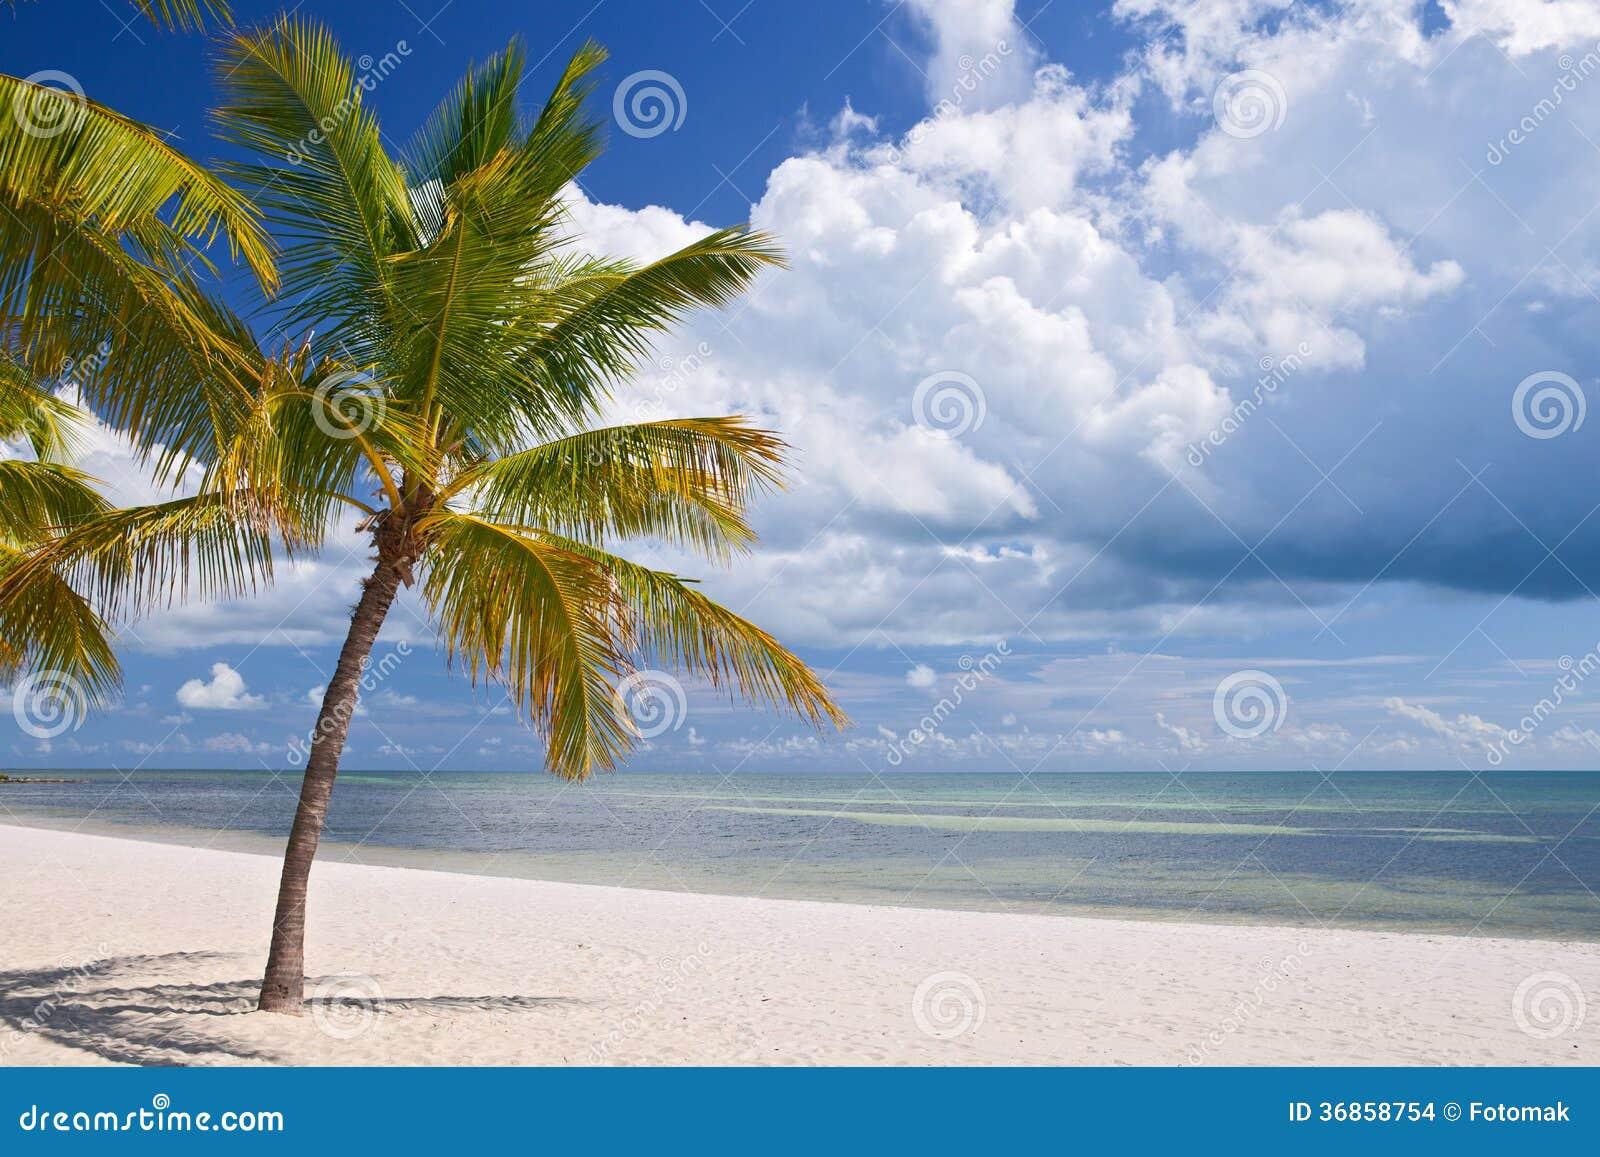 Key West Florida Beautiful Summer Beach Landscape Stock